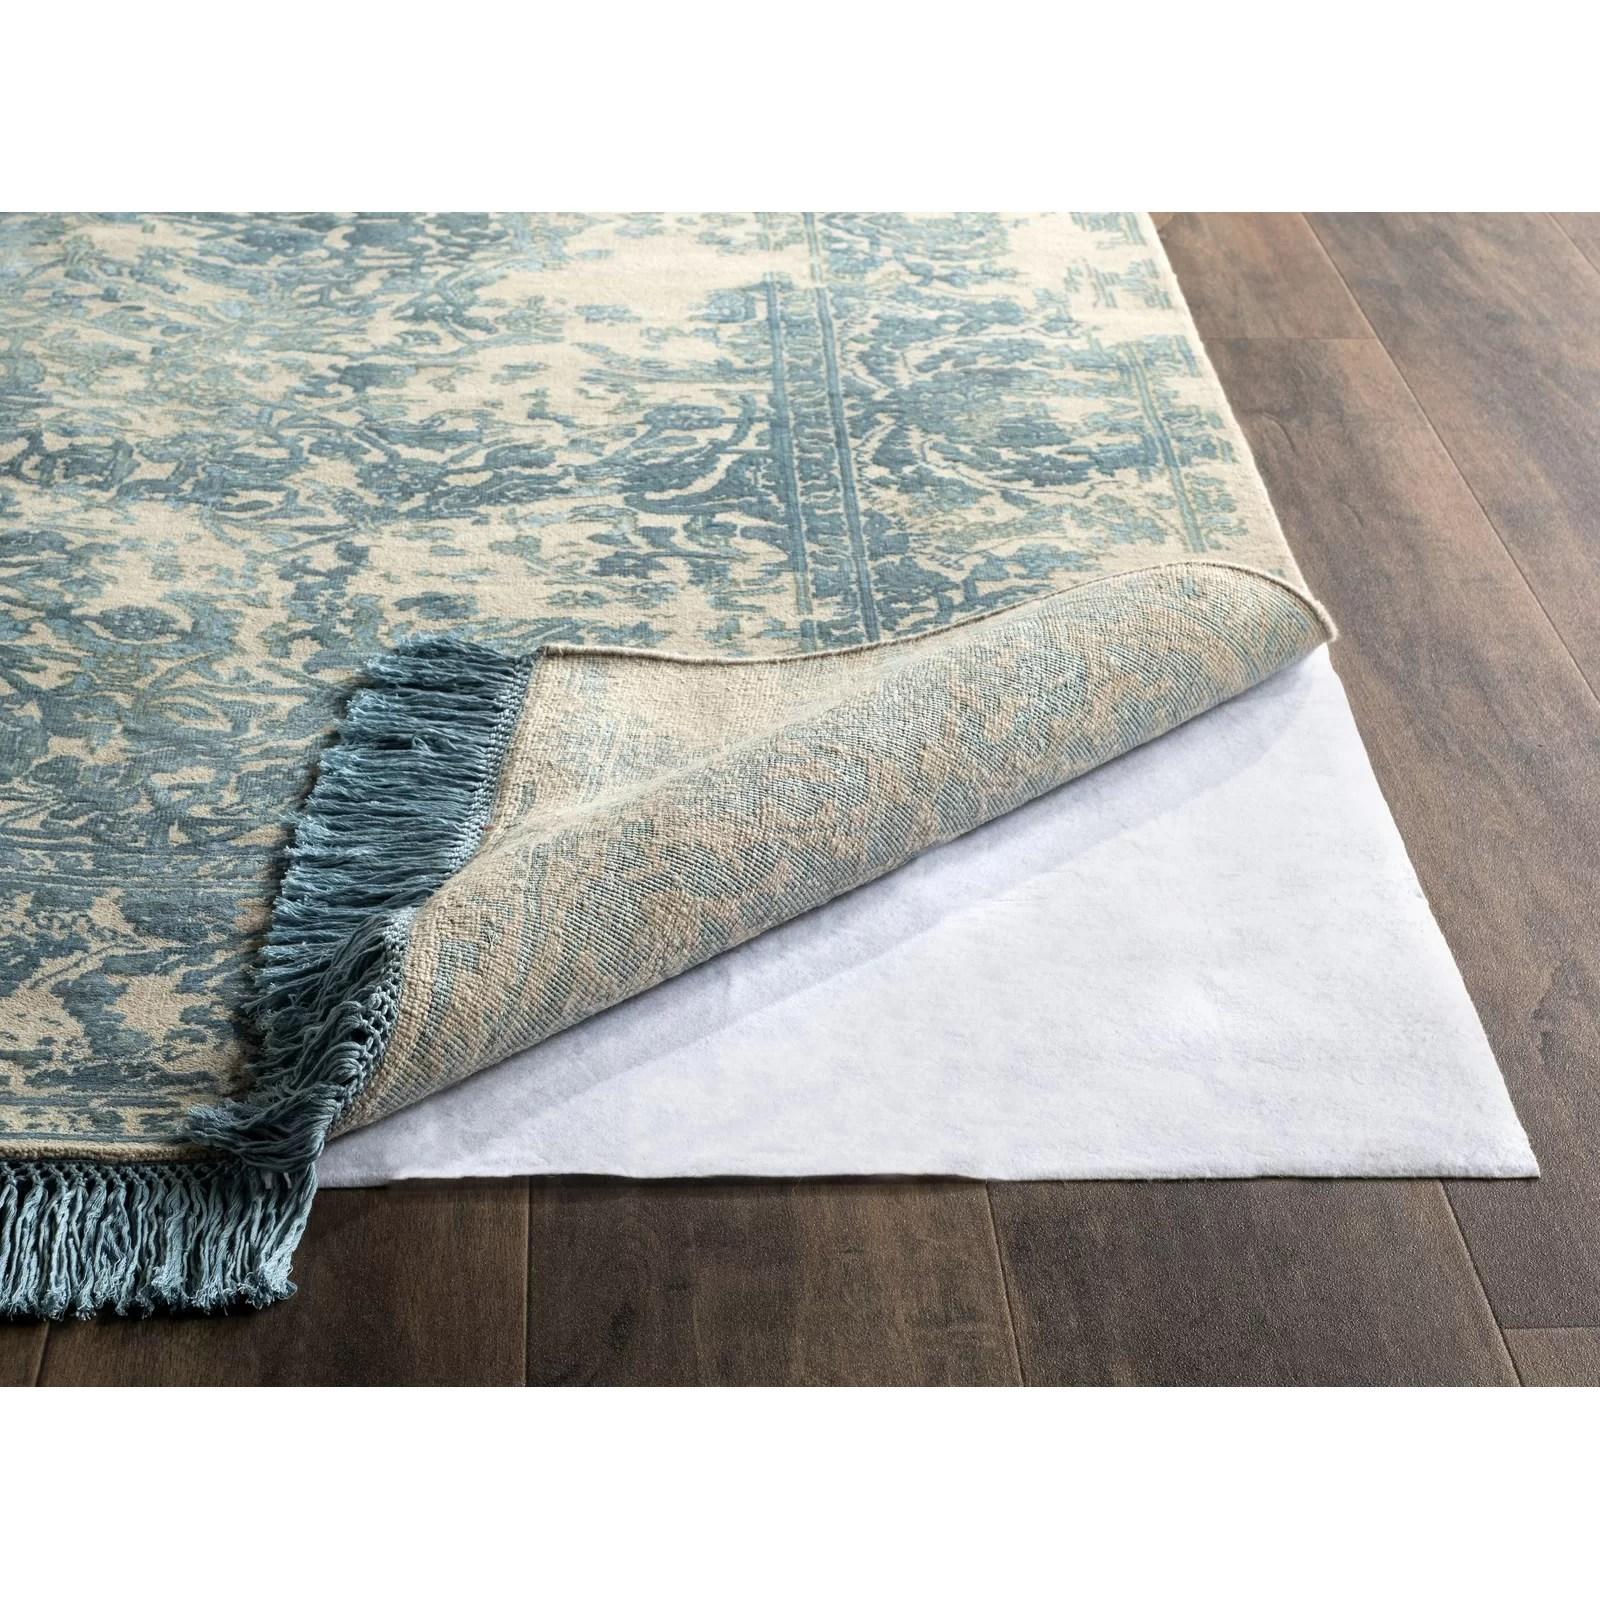 Safavieh Carpet On Carpet Rug Pad Reviews Wayfair